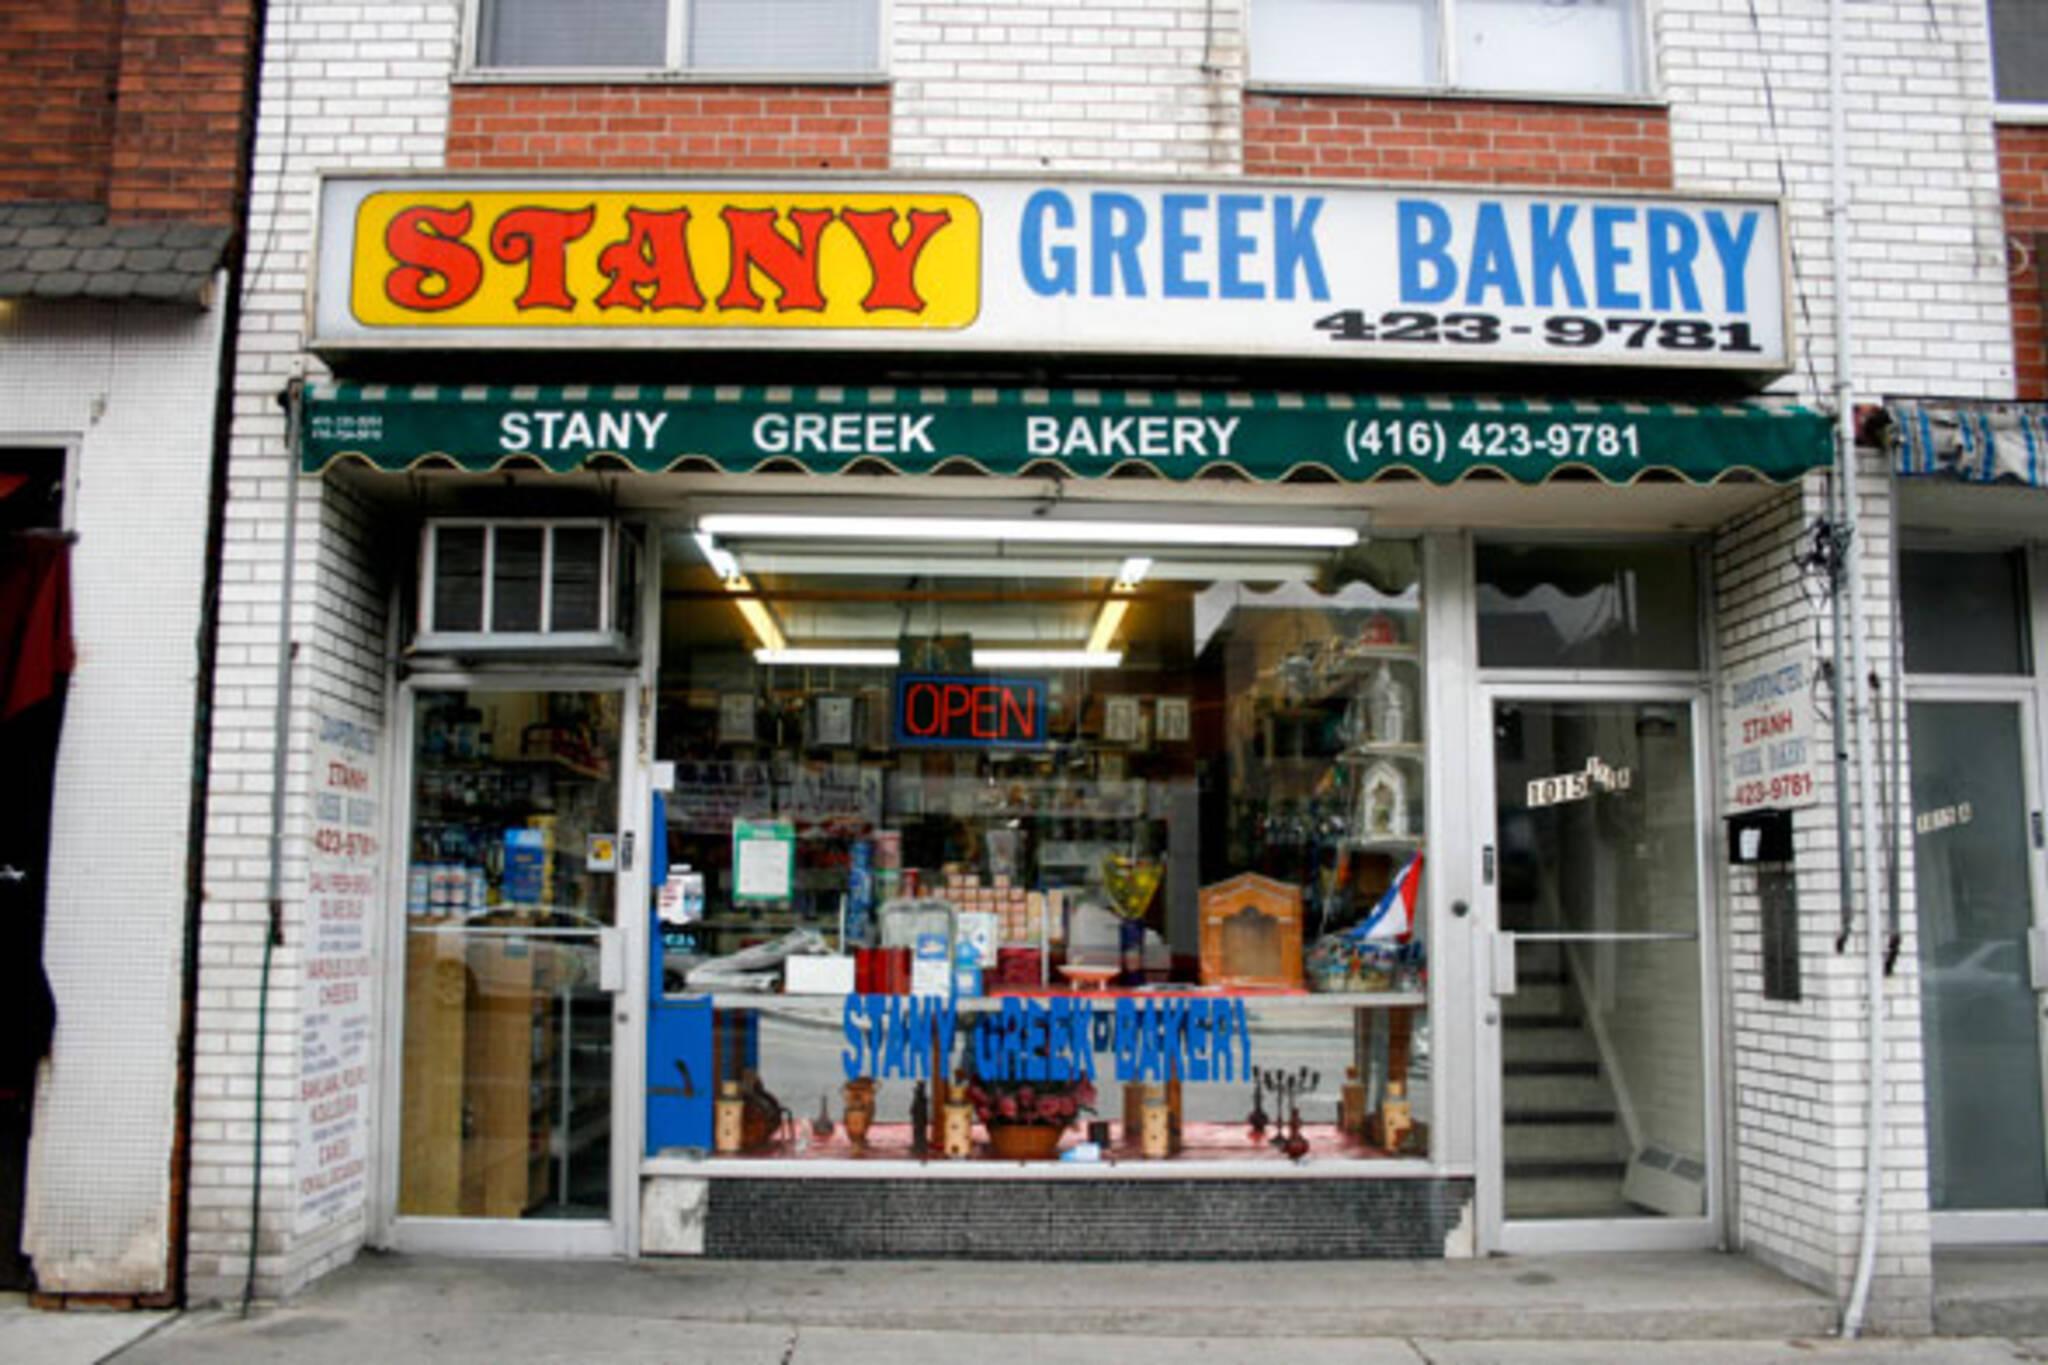 Stany Greek Bakery